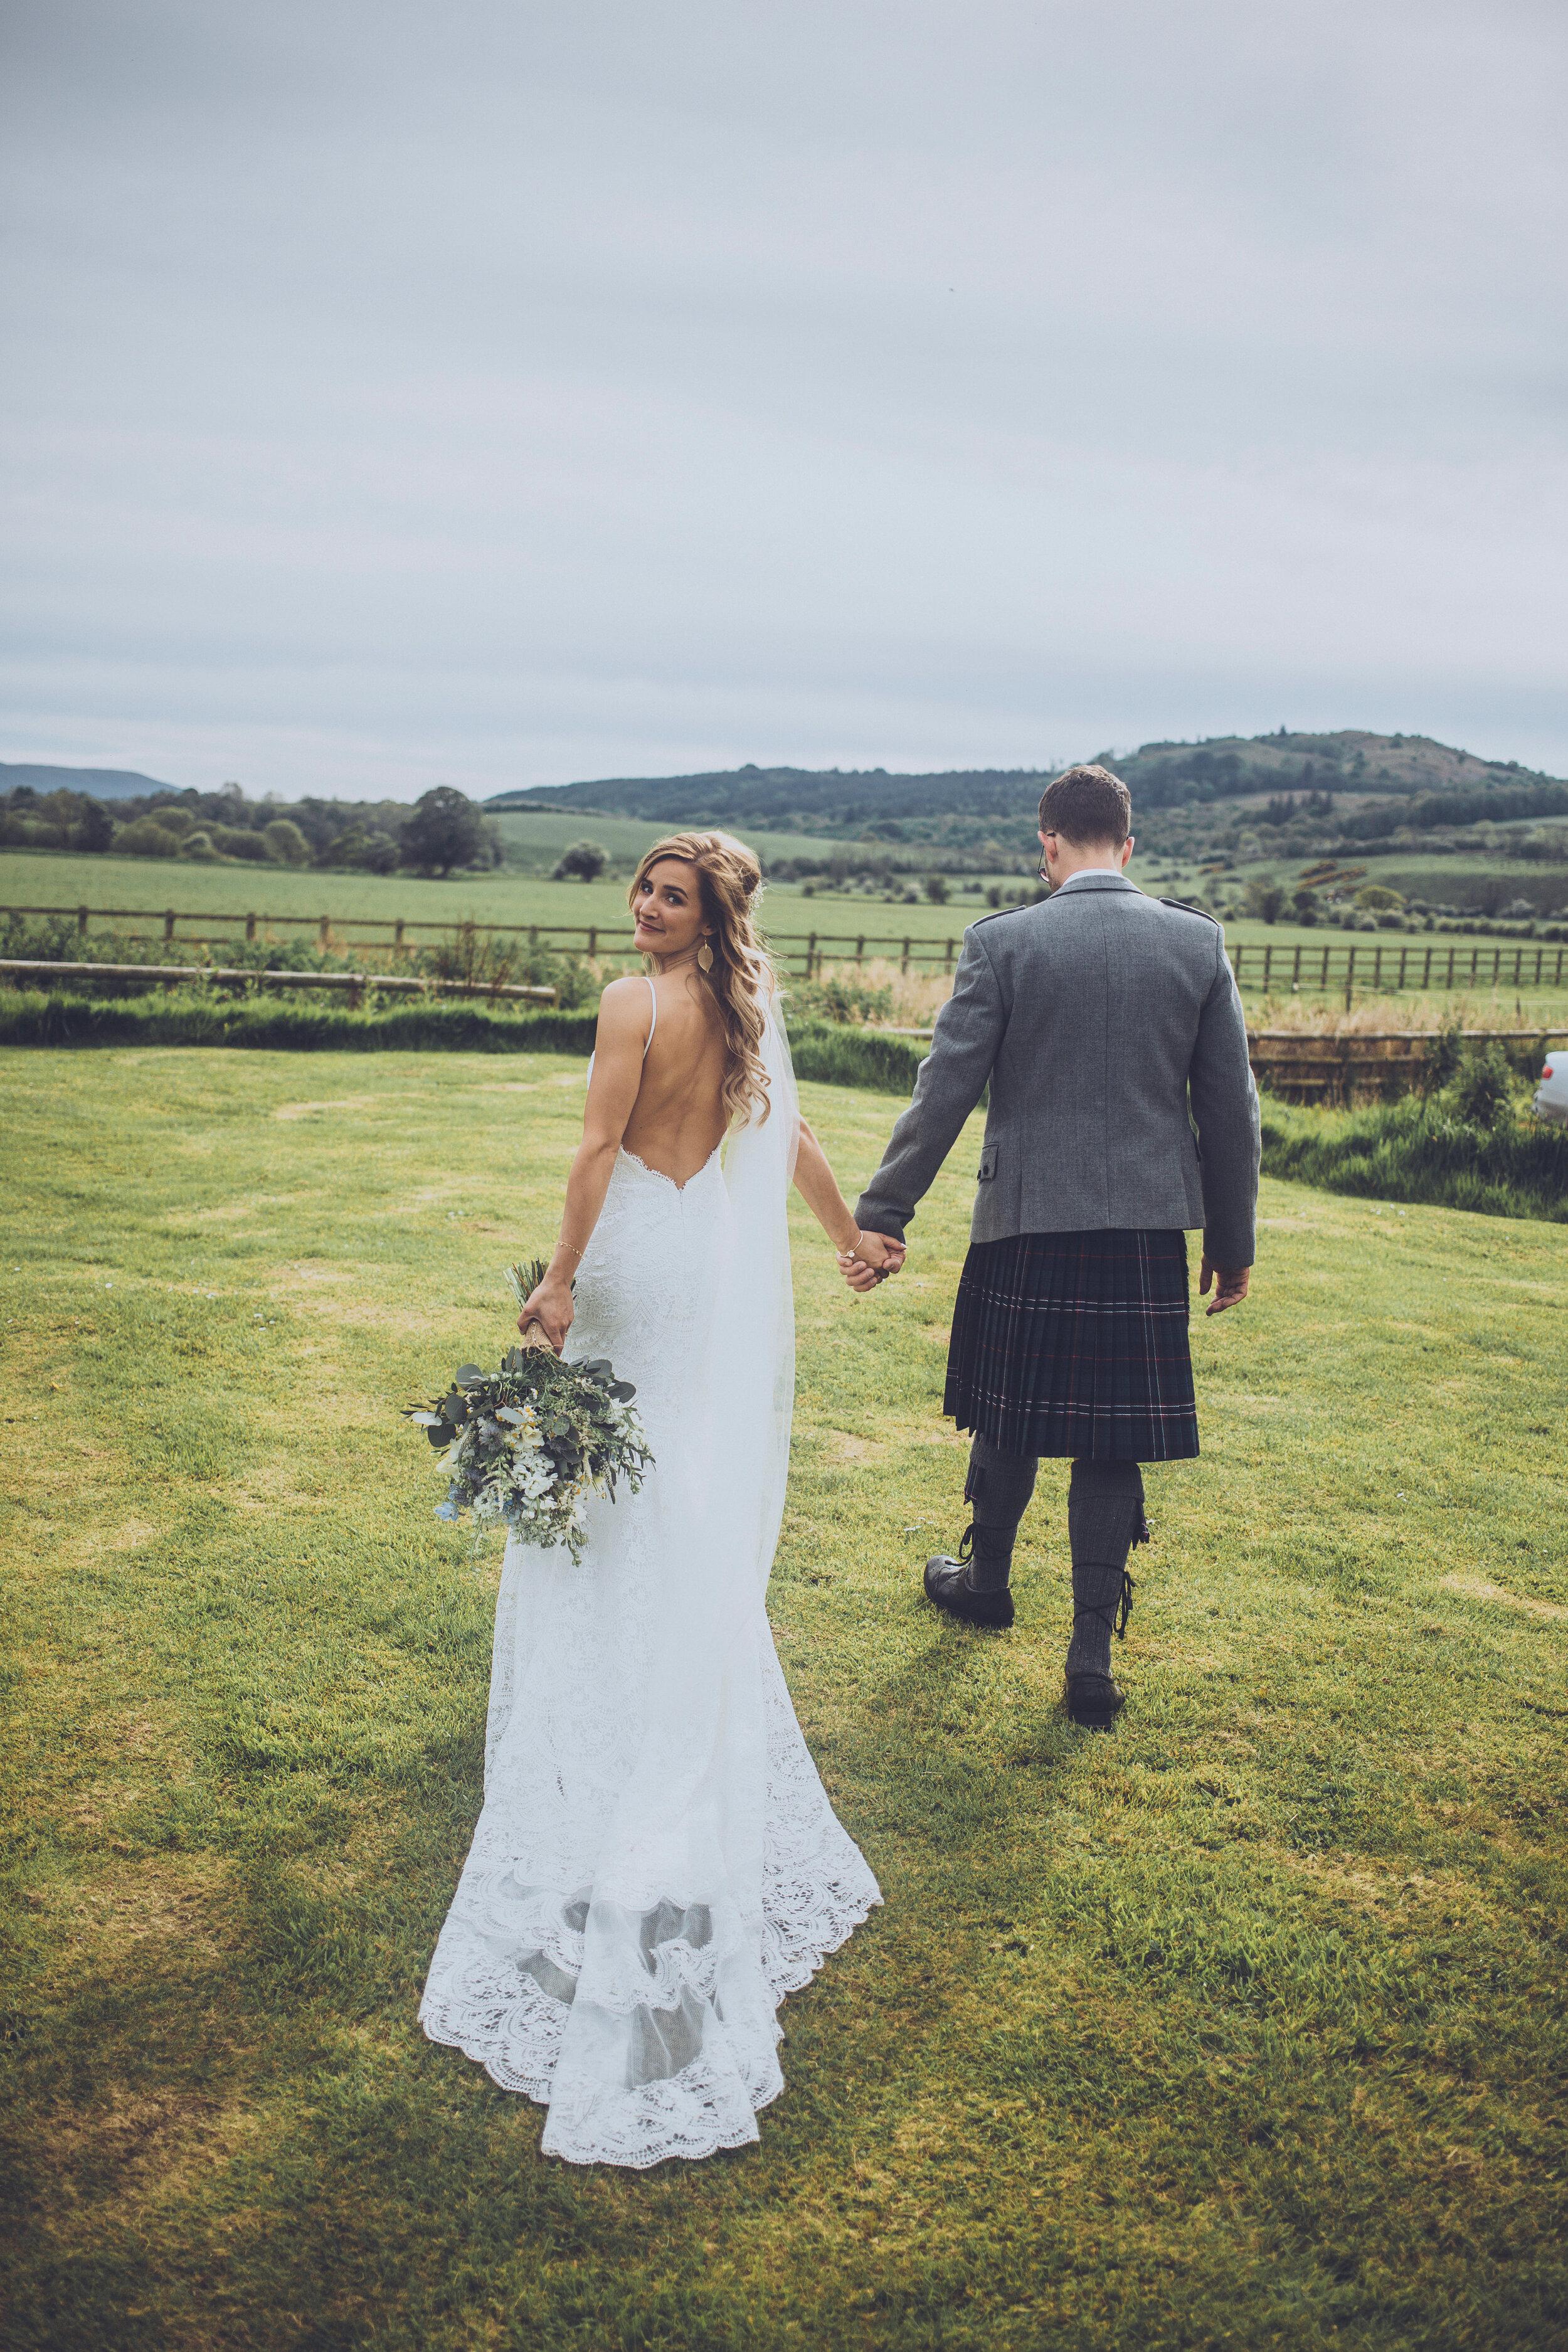 Dalduff Farm Ayrshire Wedding Photography - Claire Basiuk Photographer - 21.jpg